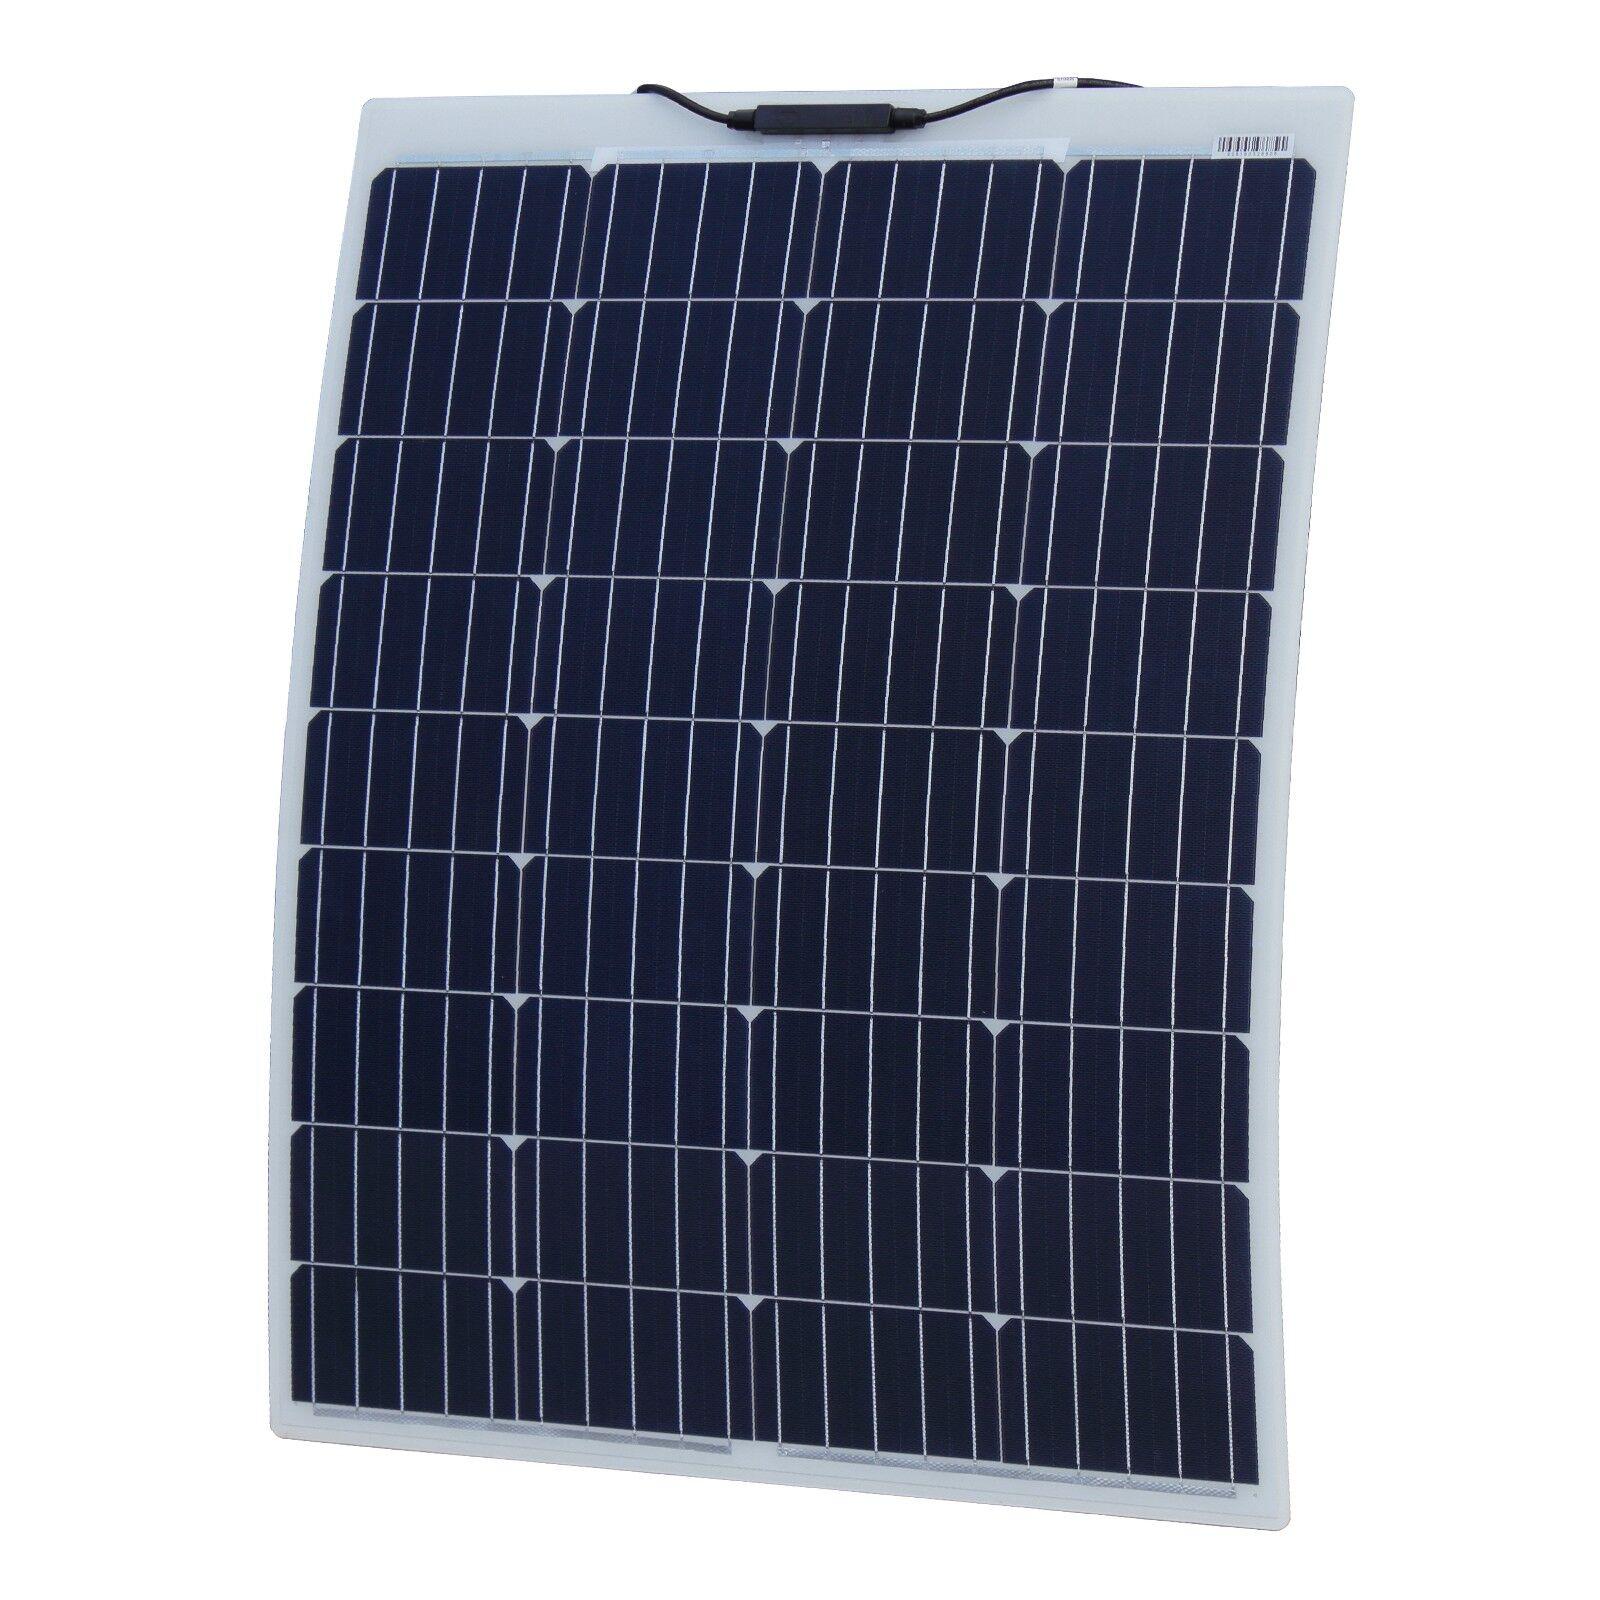 100W Reinforced semi-flexible solar panel with ETFE coating (German solar cells)